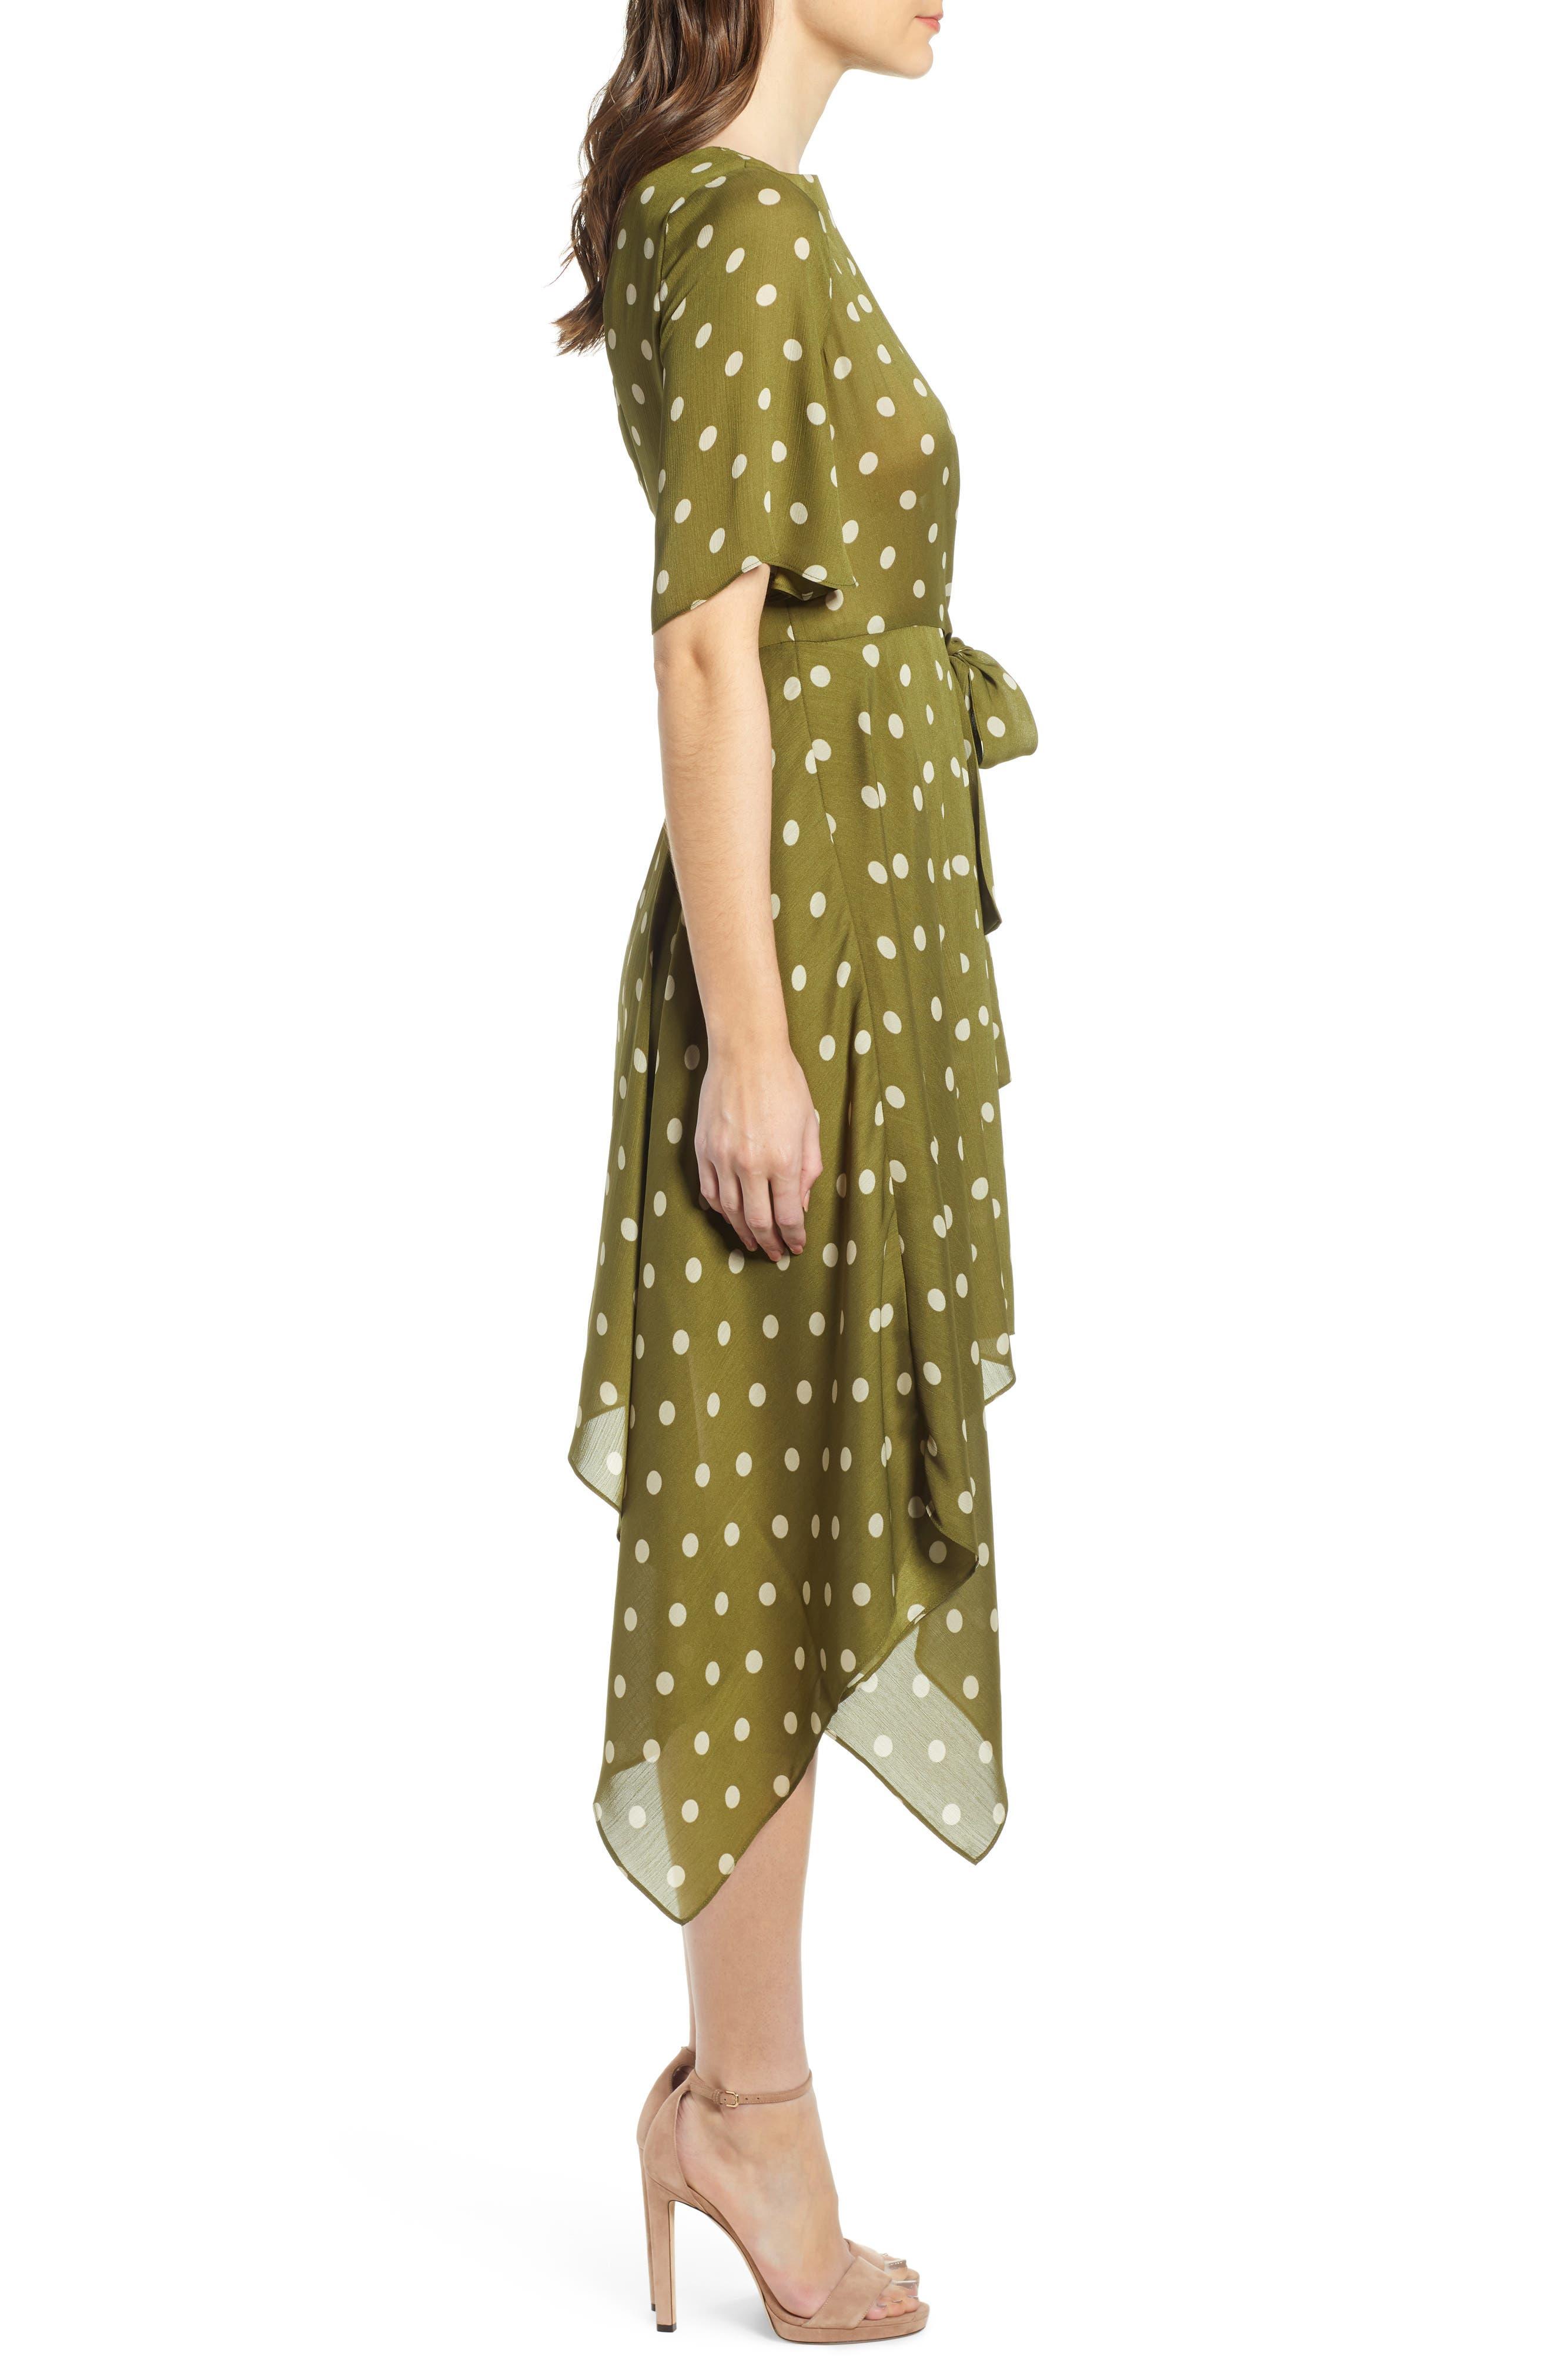 CHRISELLE LIM COLLECTION, Chriselle Lim Marie Handkerchief Hem Midi Dress, Alternate thumbnail 4, color, CREAM/ OLIVE